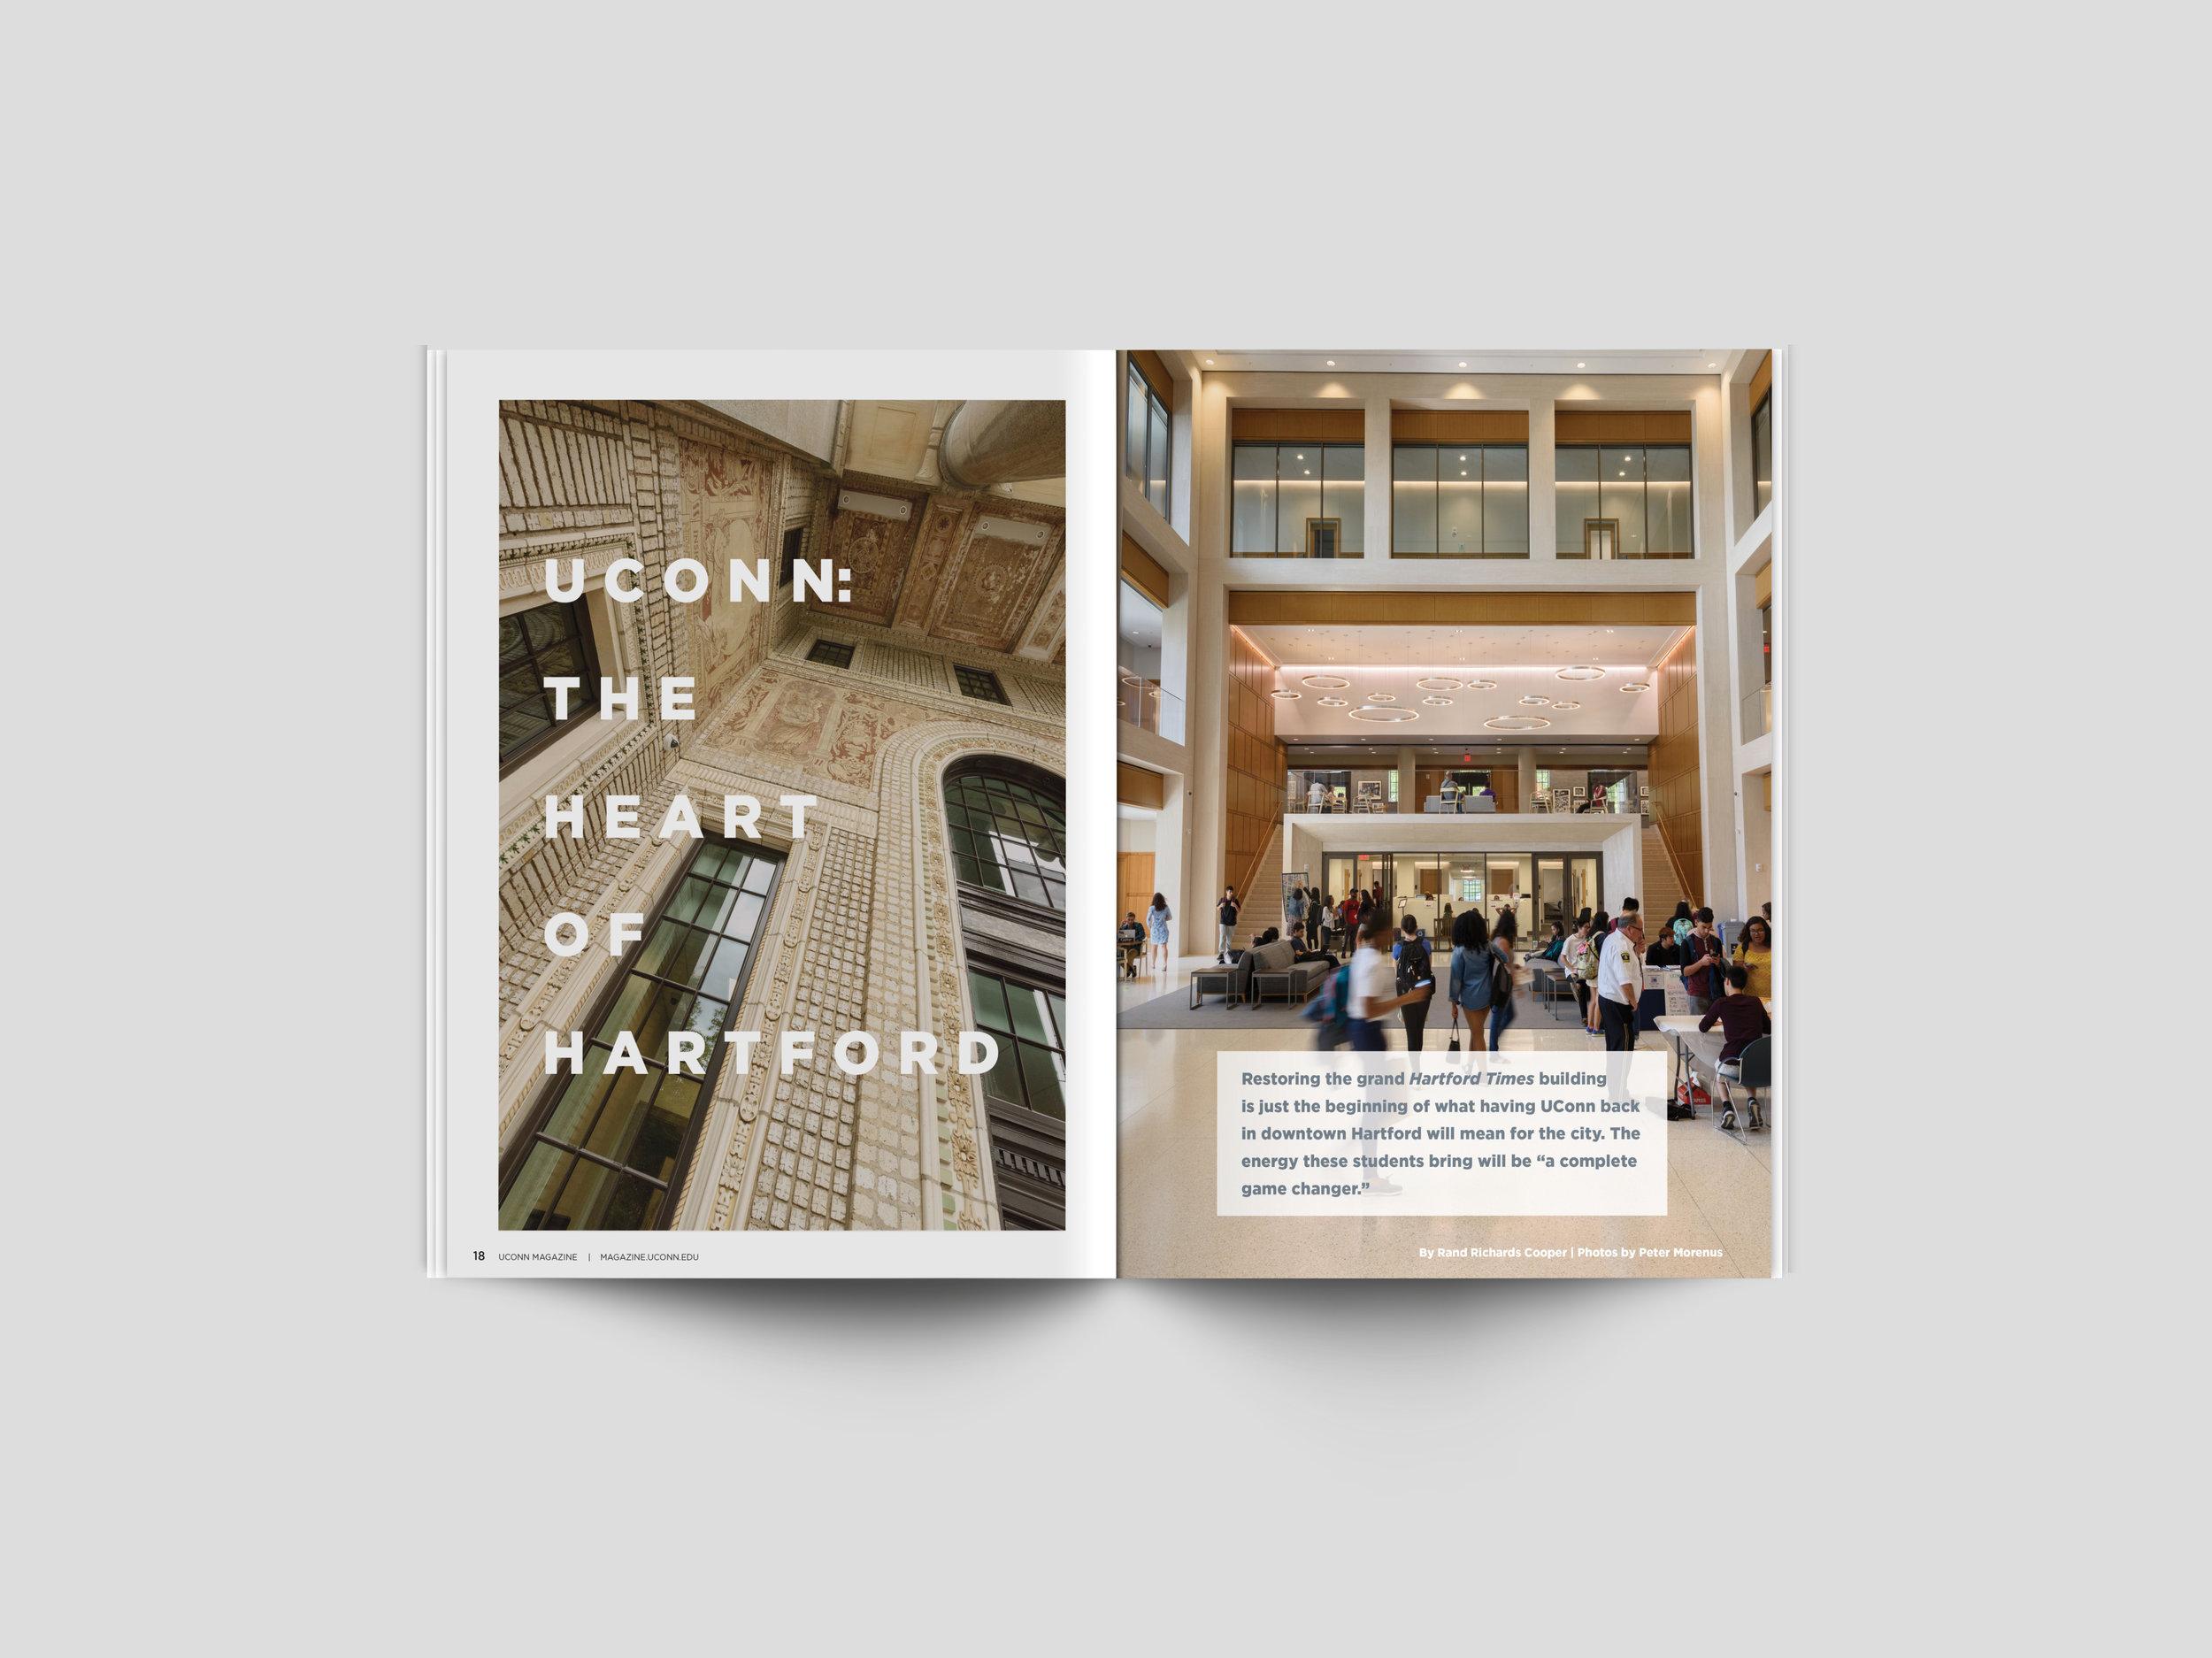 UConn: The Heart of Hartford – Summer 2017